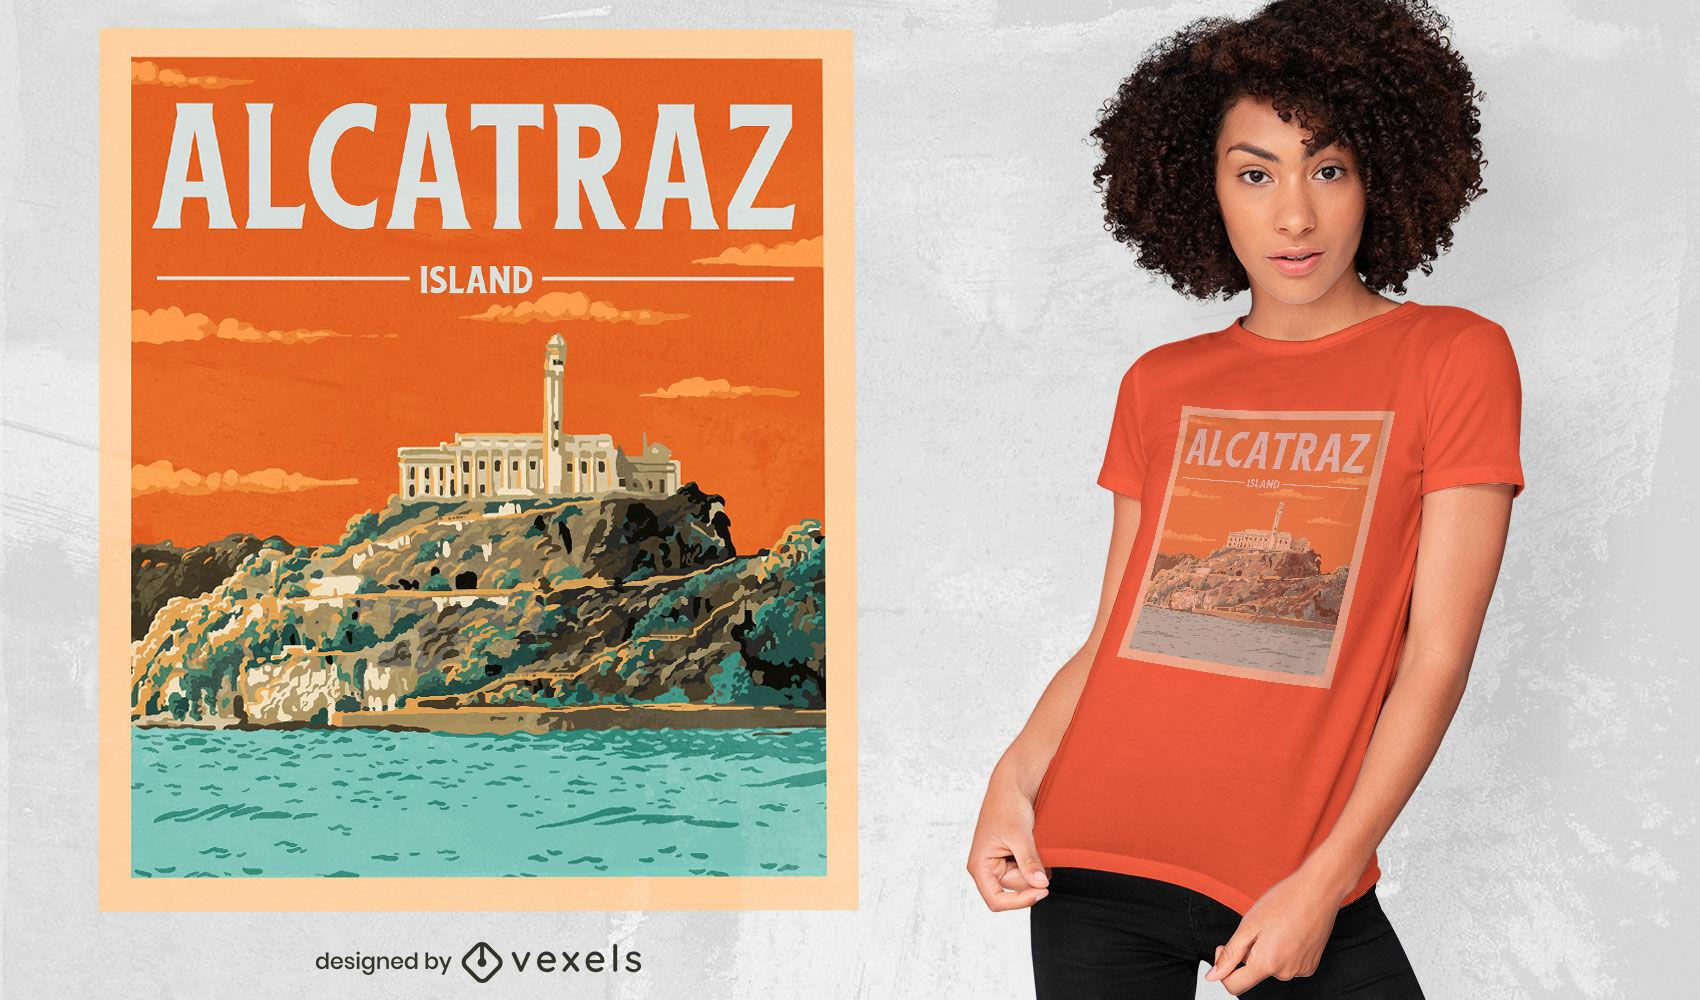 Alcatraz prison travel poster t-shirt design